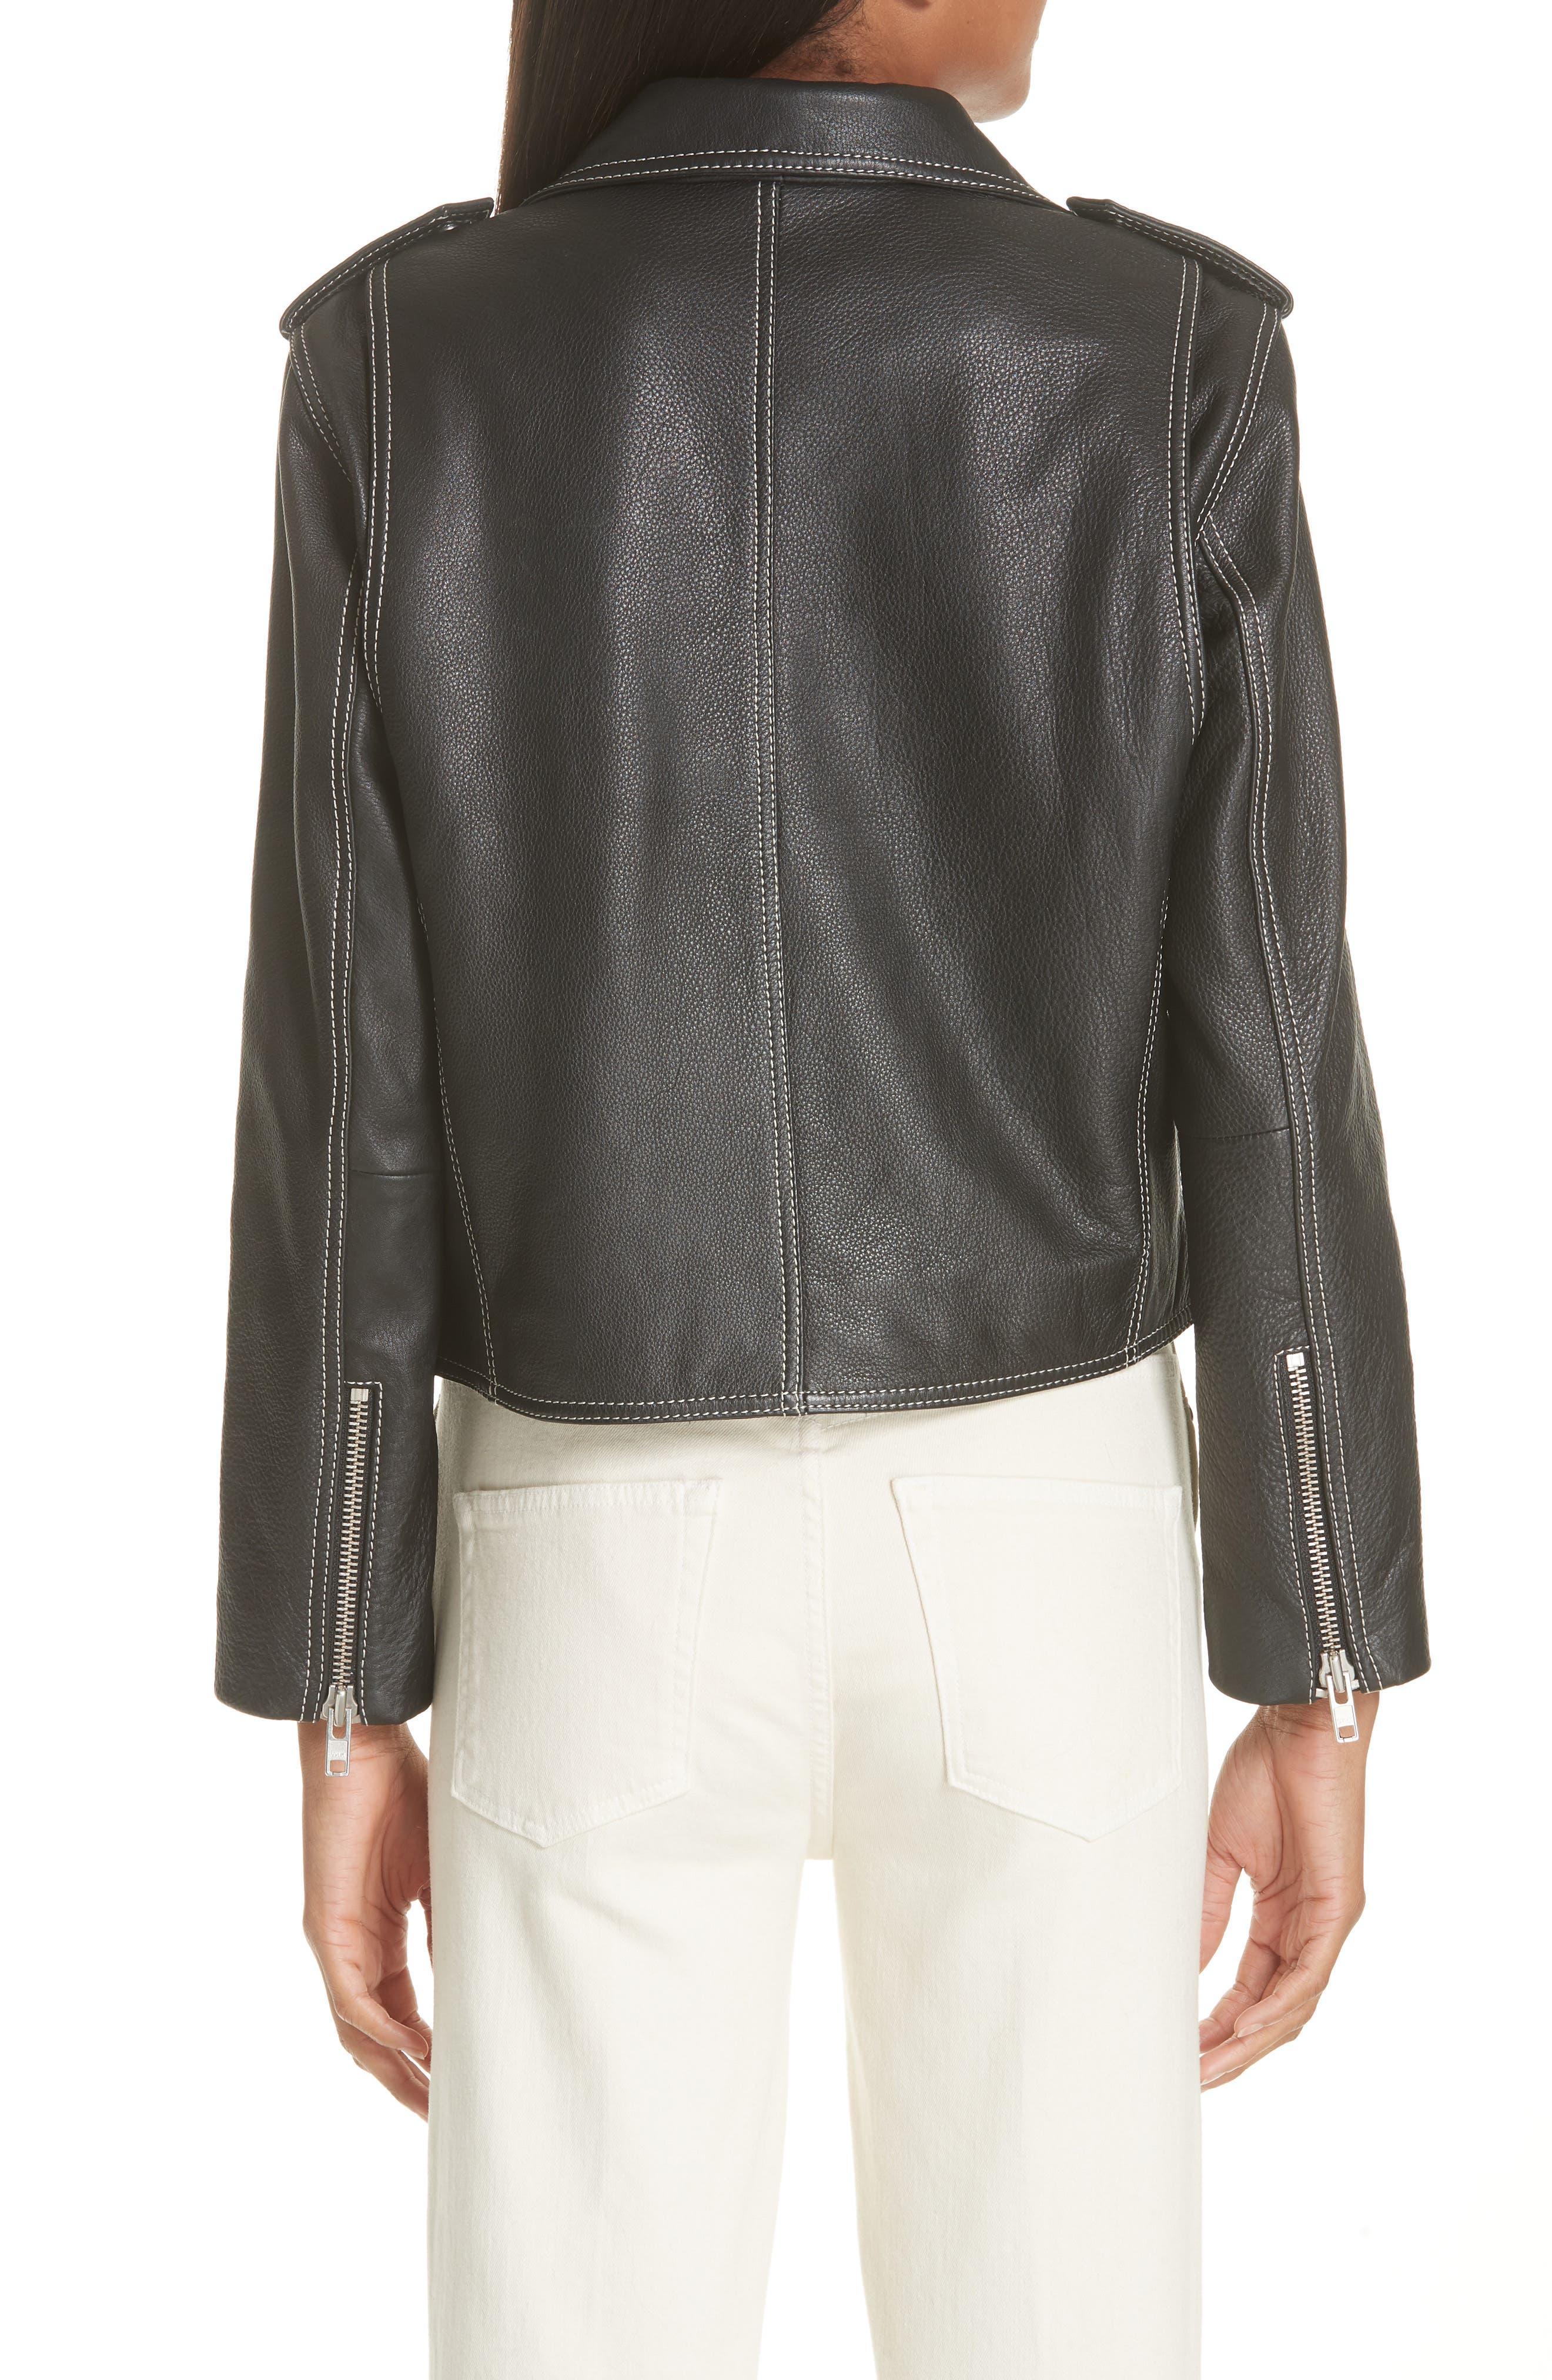 GANNI,                             Angela Leather Jacket,                             Alternate thumbnail 2, color,                             099